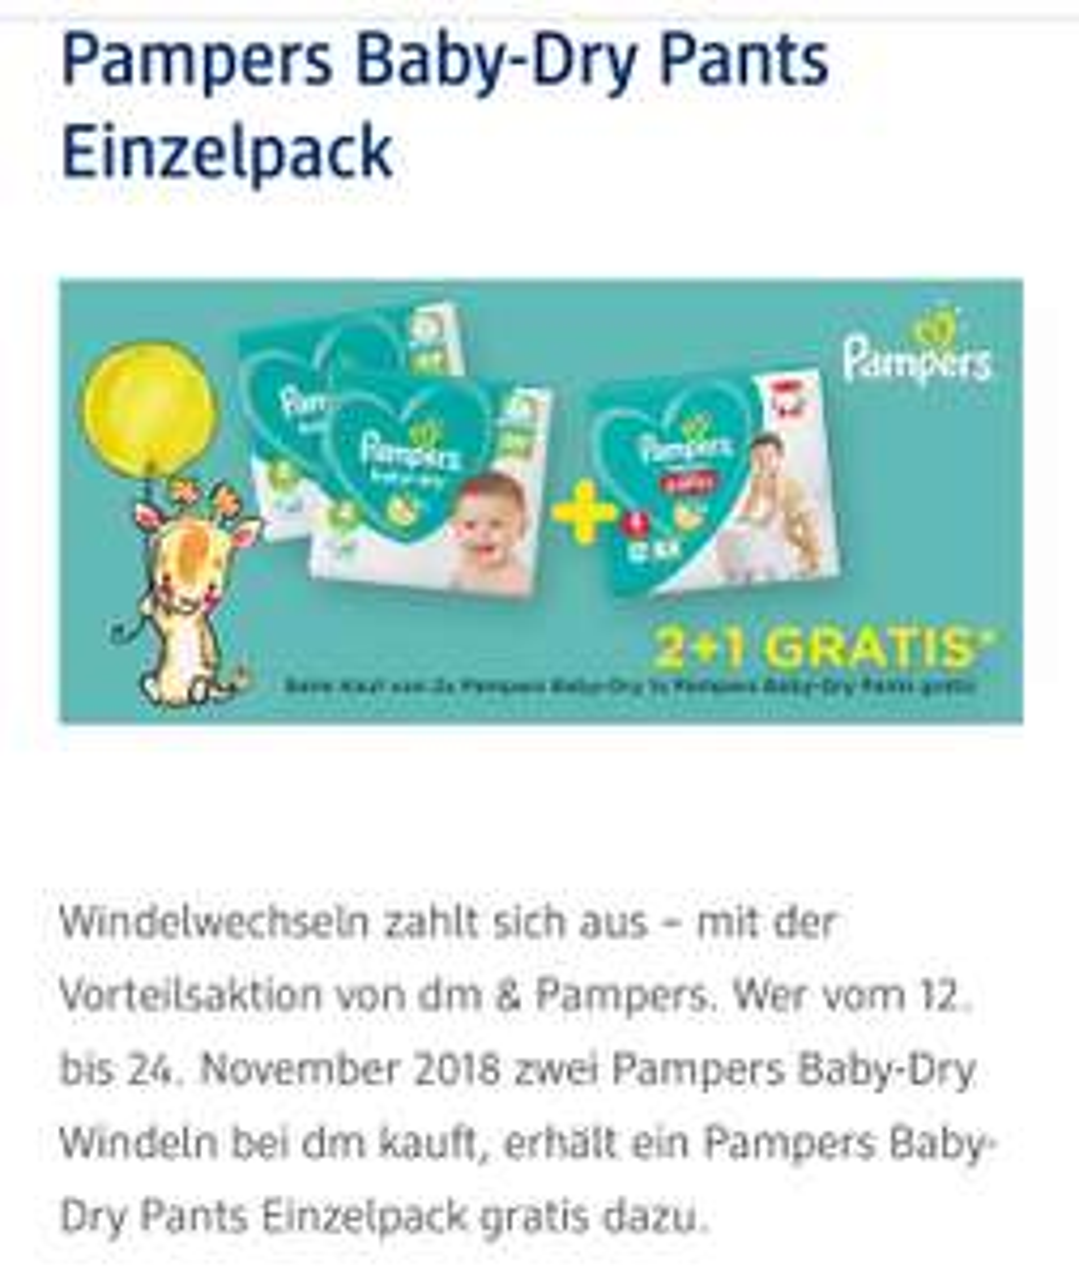 dm 2 pakete pampers baby dry kaufen 1 packung pampers baby dry pants gratis dazu. Black Bedroom Furniture Sets. Home Design Ideas